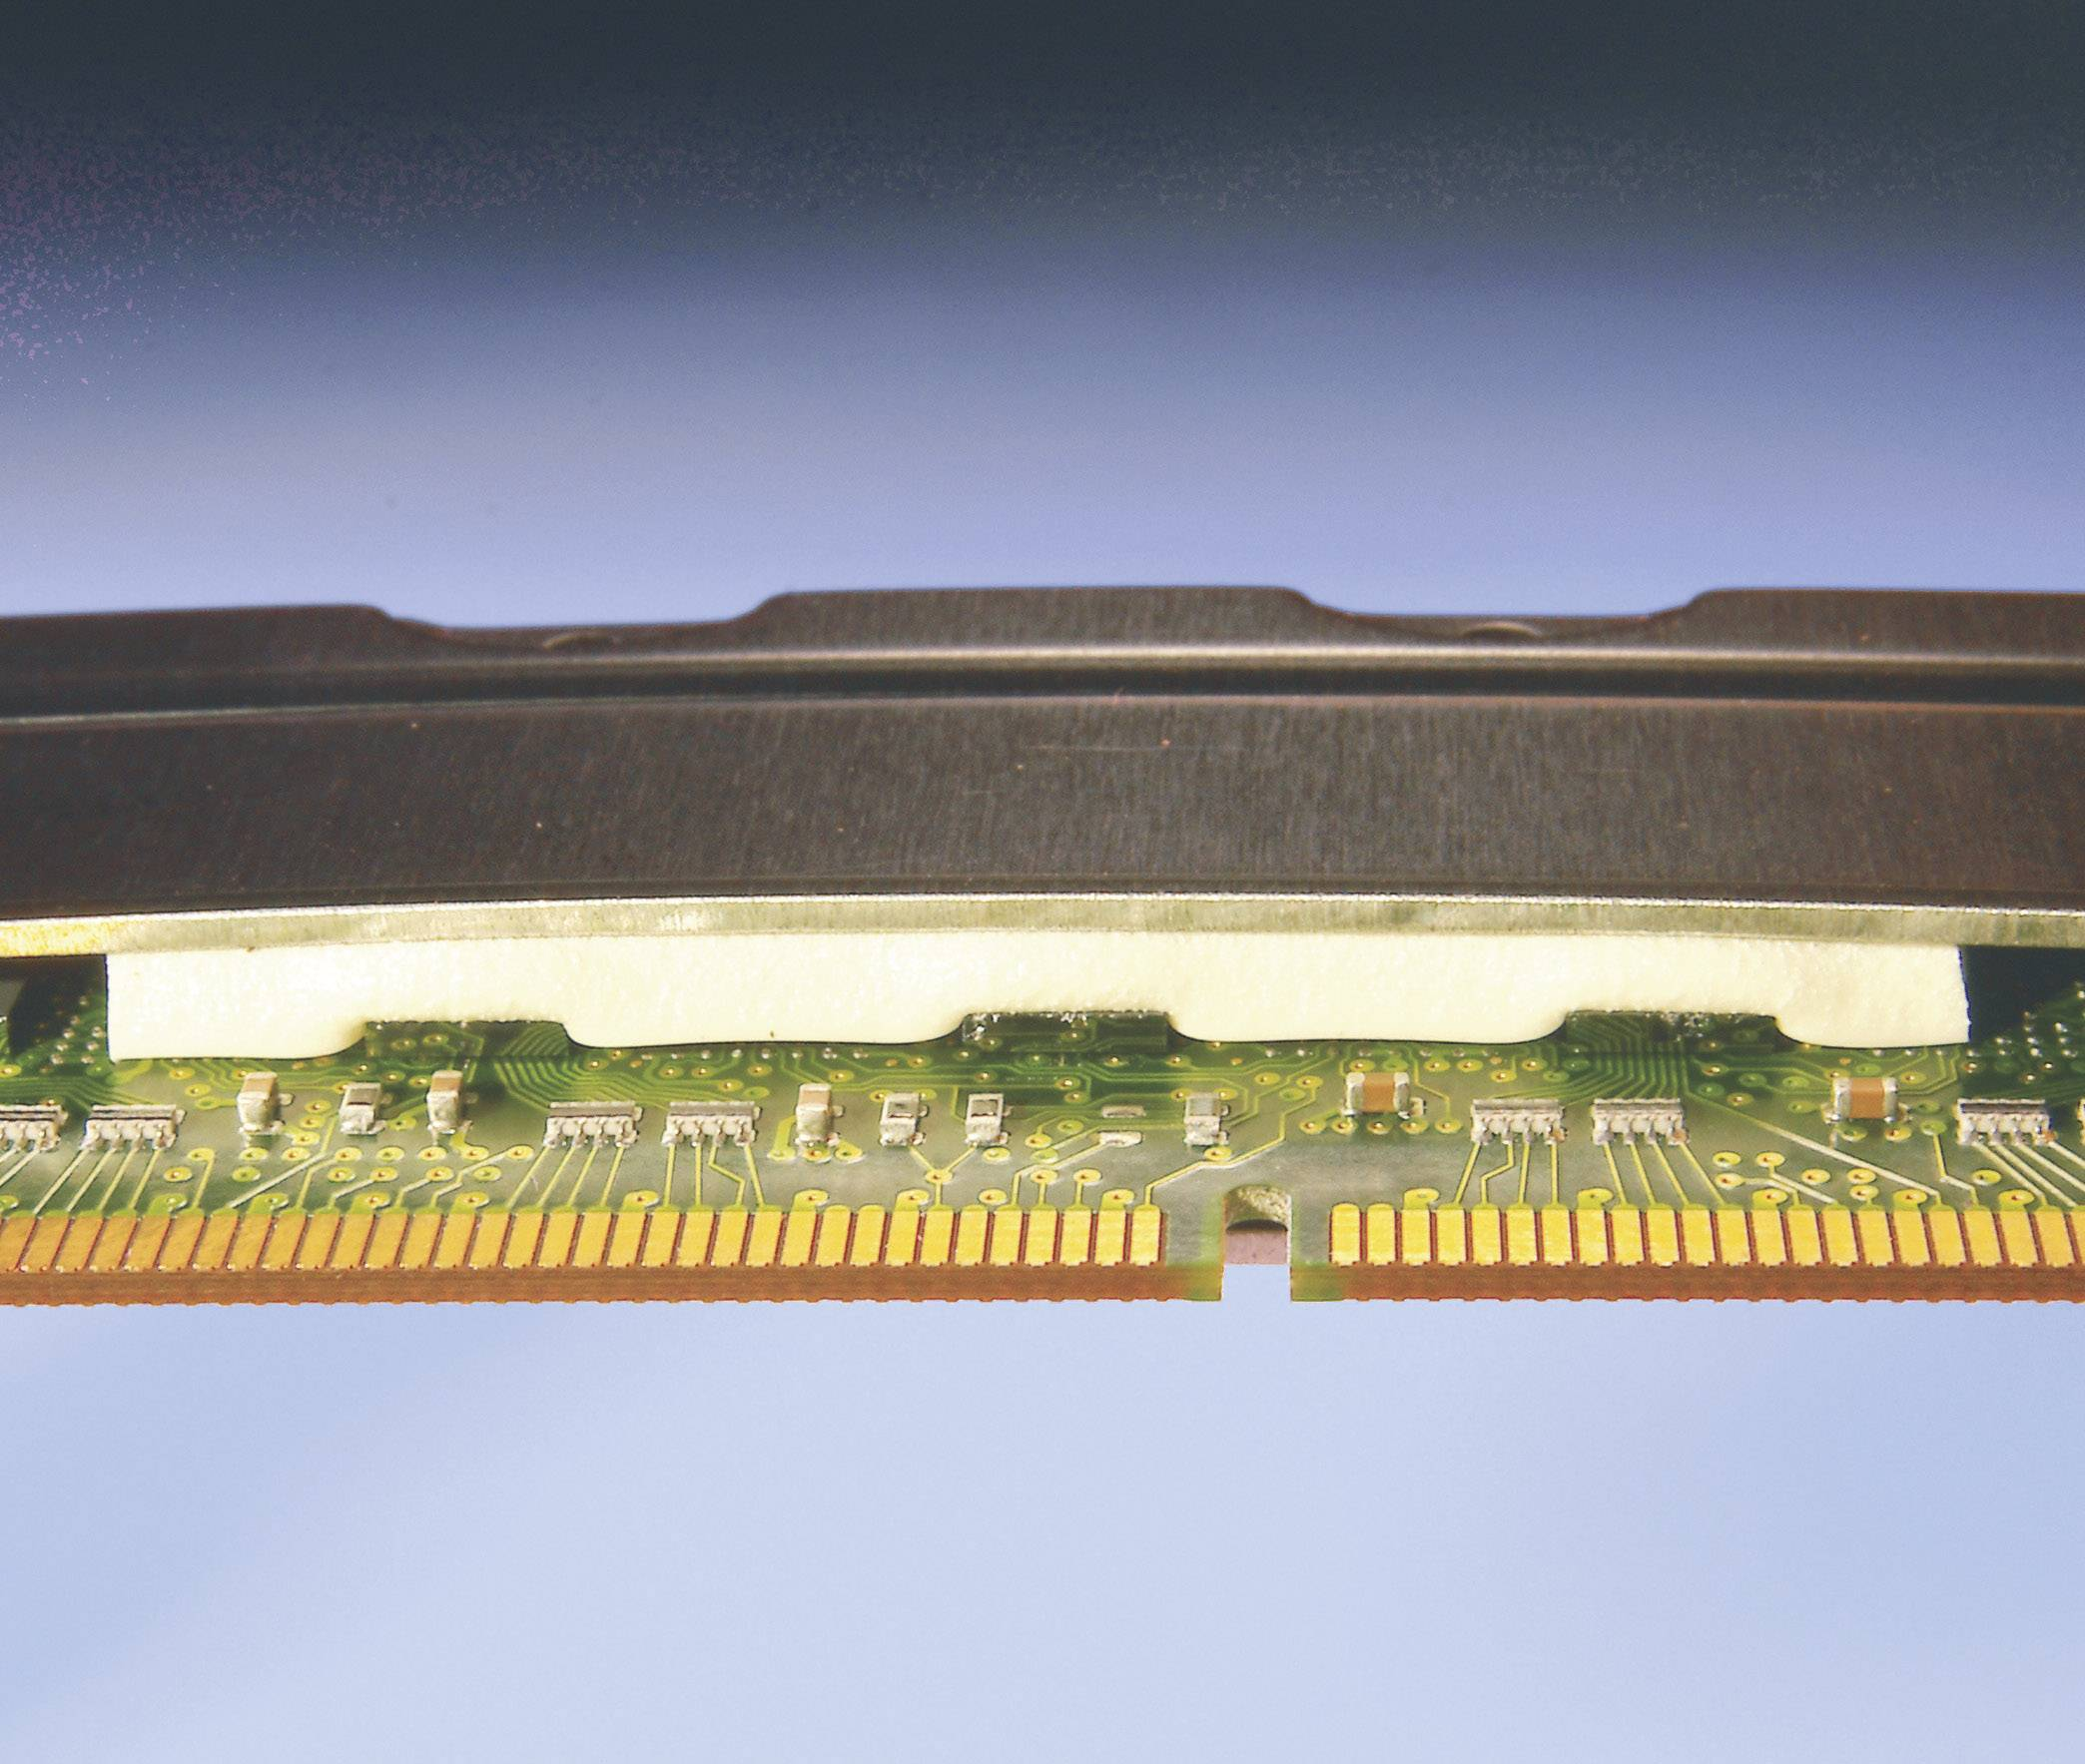 Teplovodivá fólia Kerafol SOFTTHERM 86/200, 2 mm, 1 W/mK, (d x š) 200 mm x 120 mm